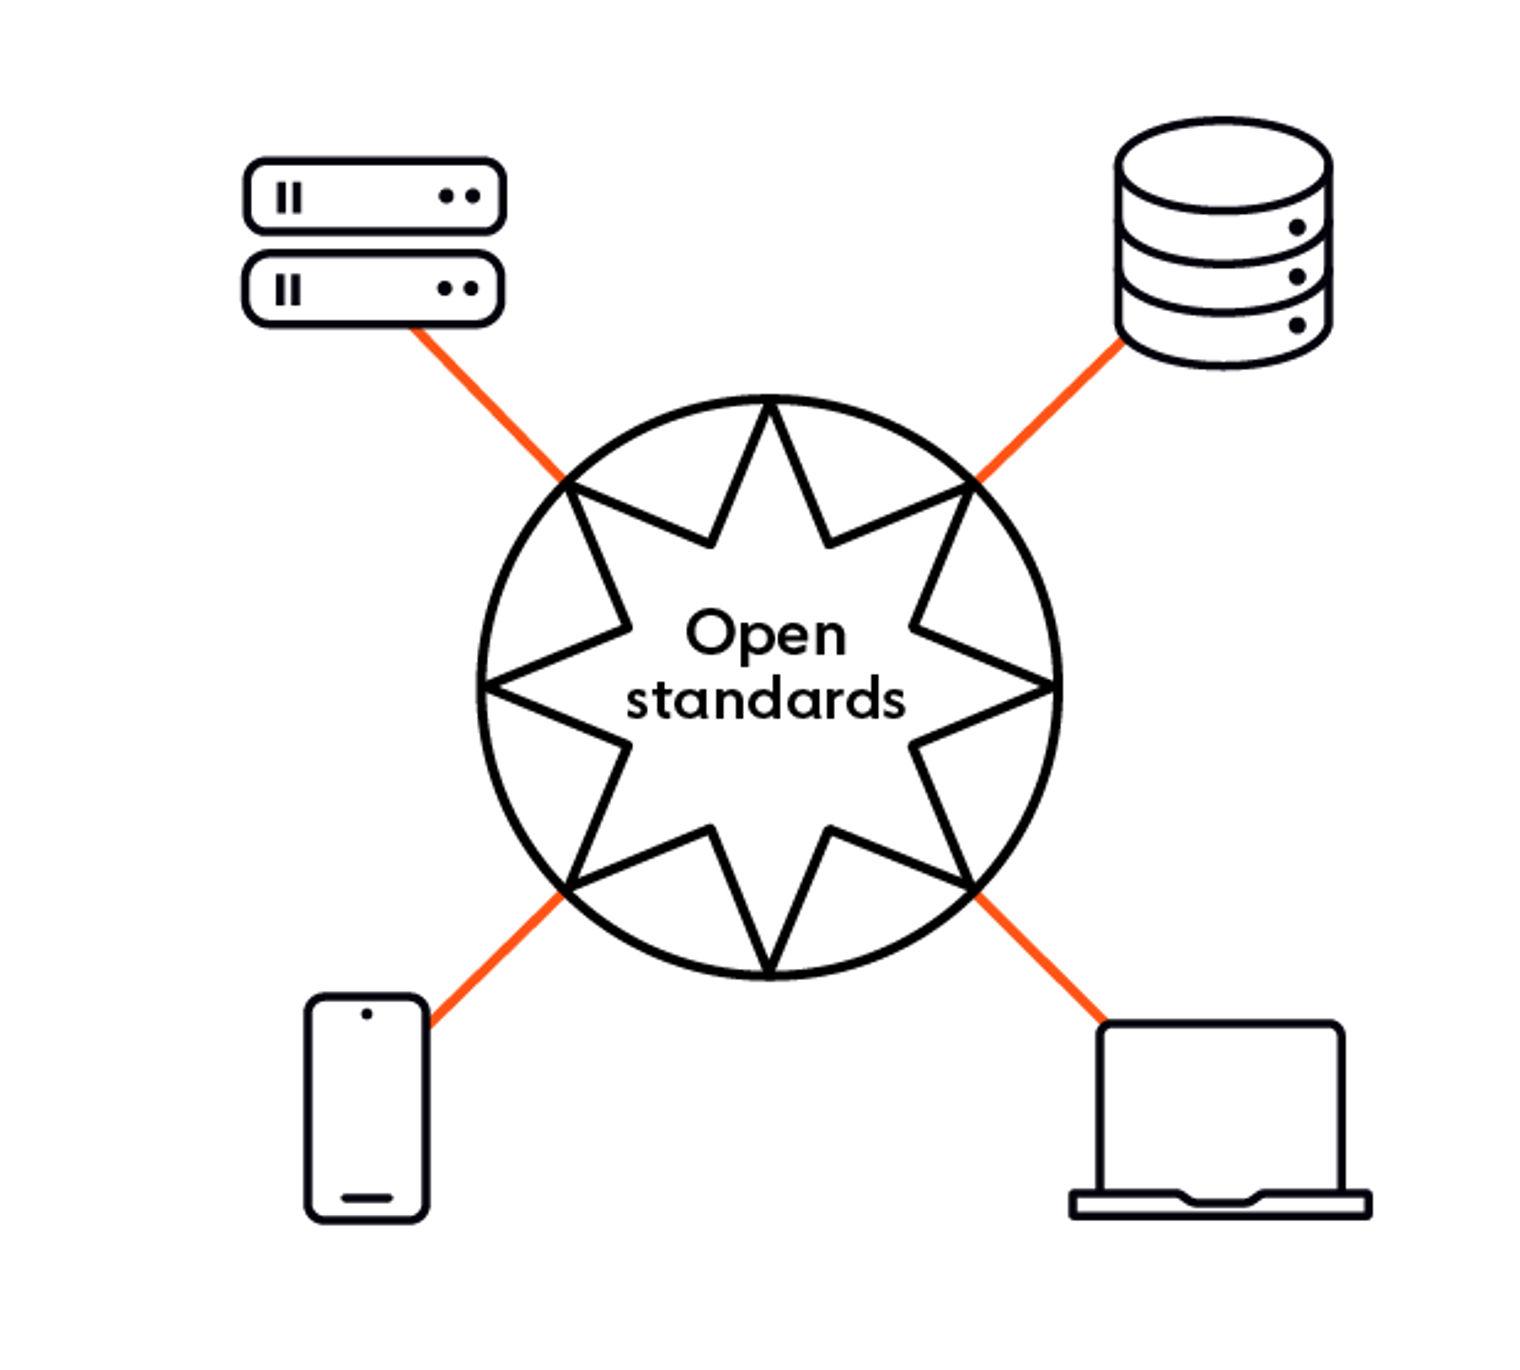 Open standards help you achieve interoperability